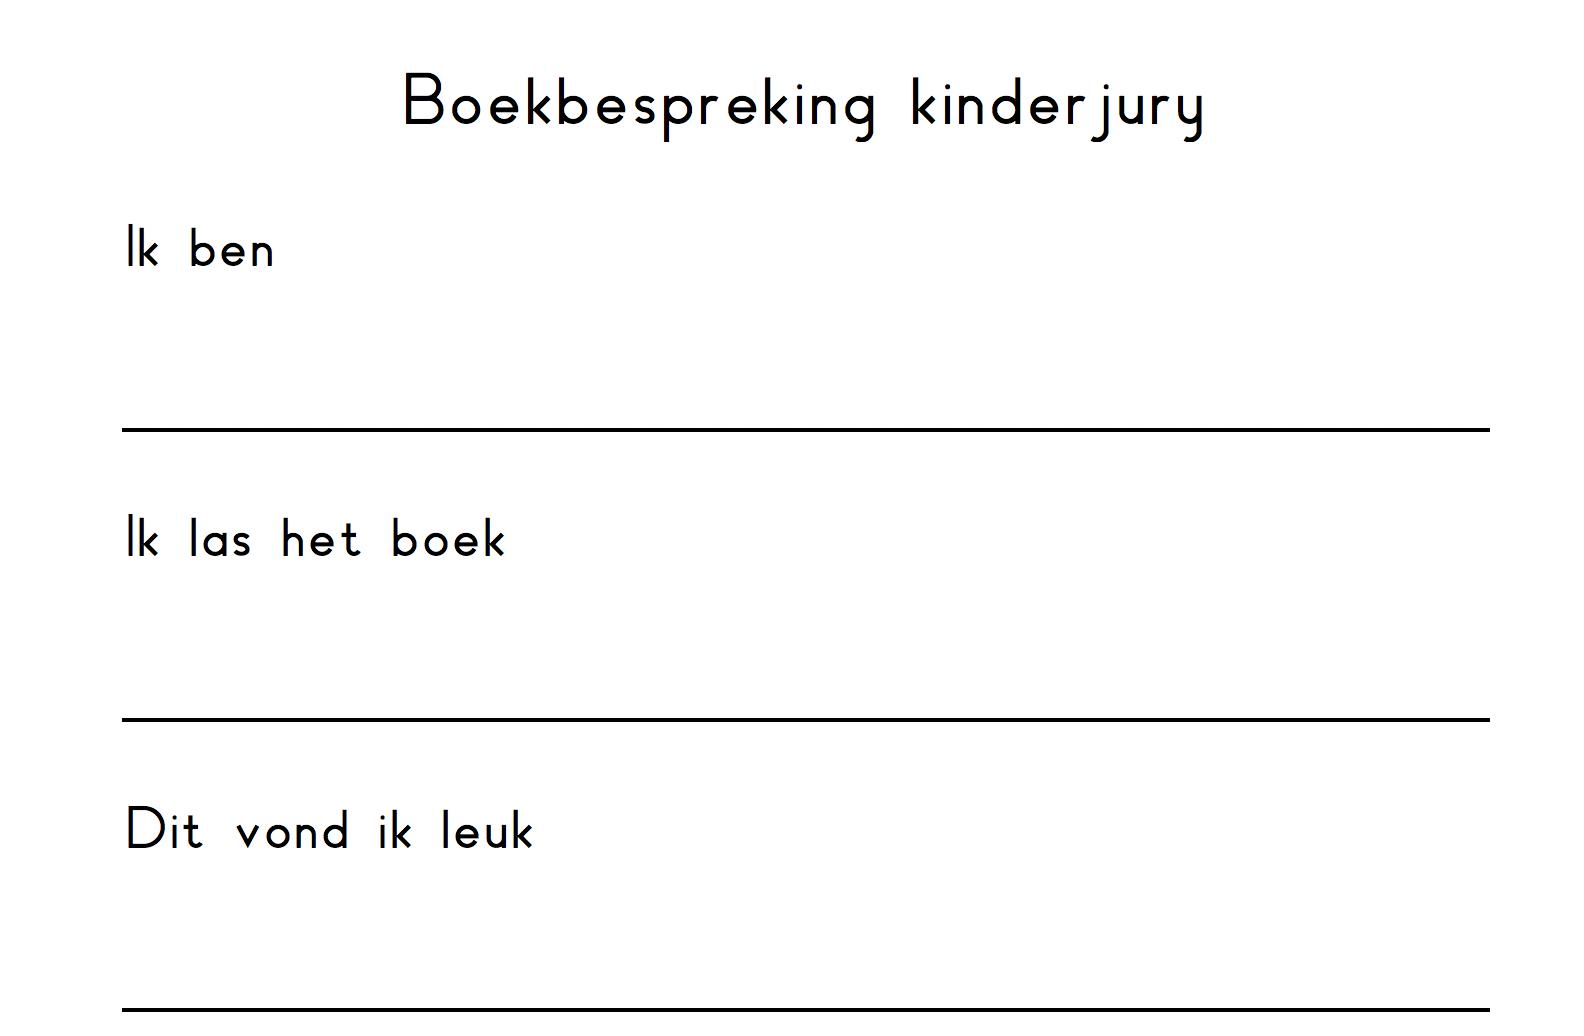 Boekbespreking kinderjury